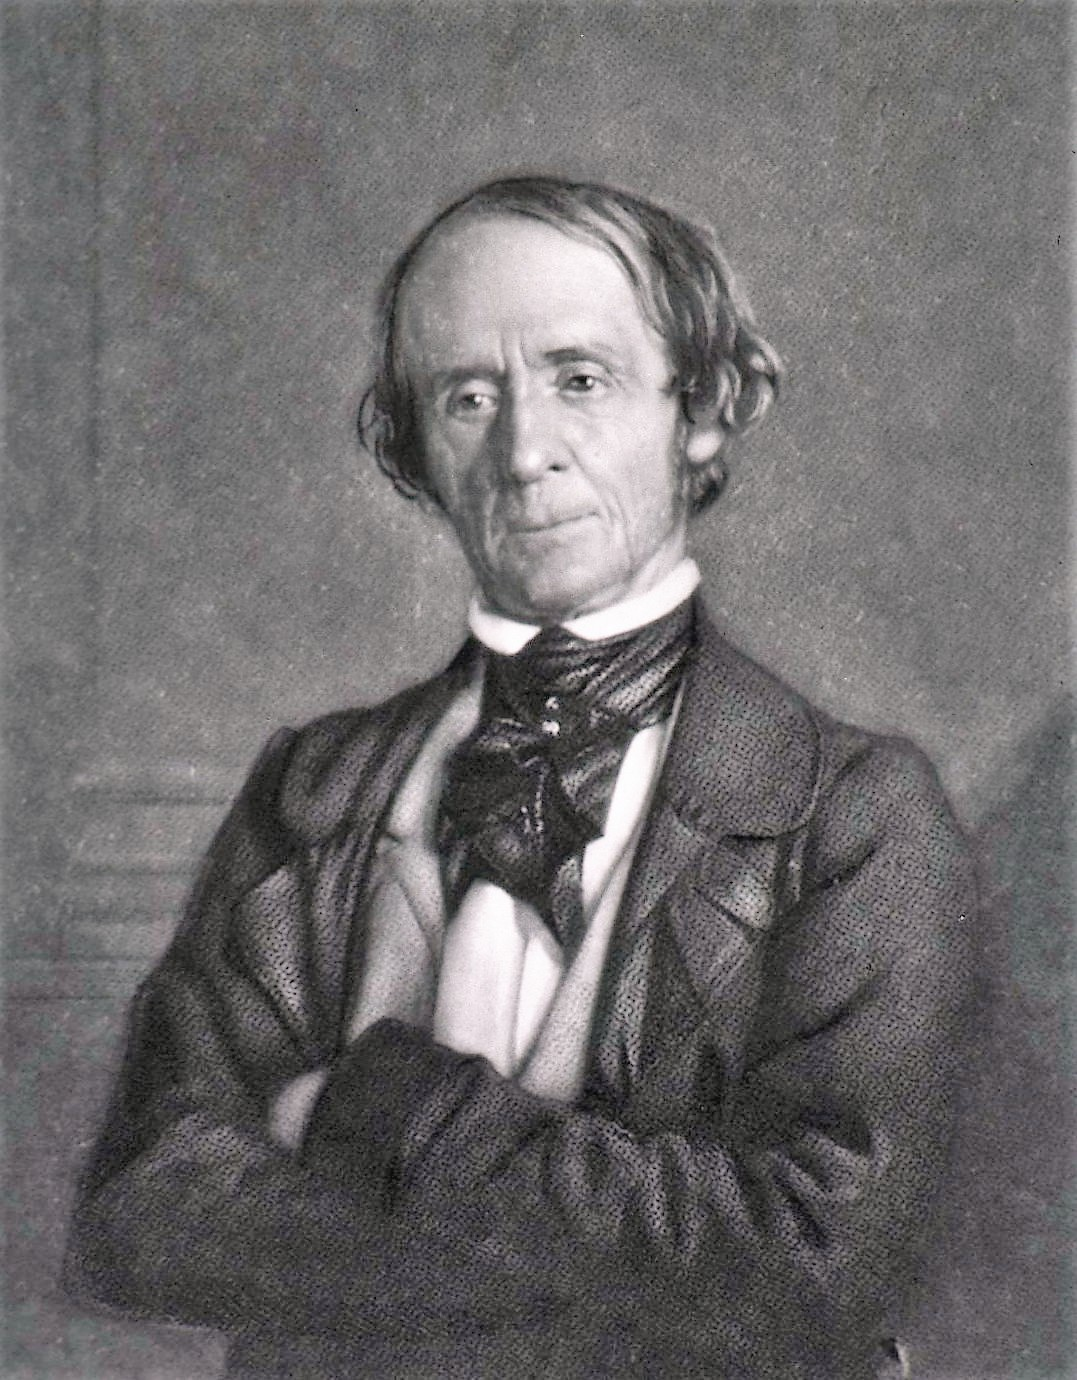 Meigs portrait